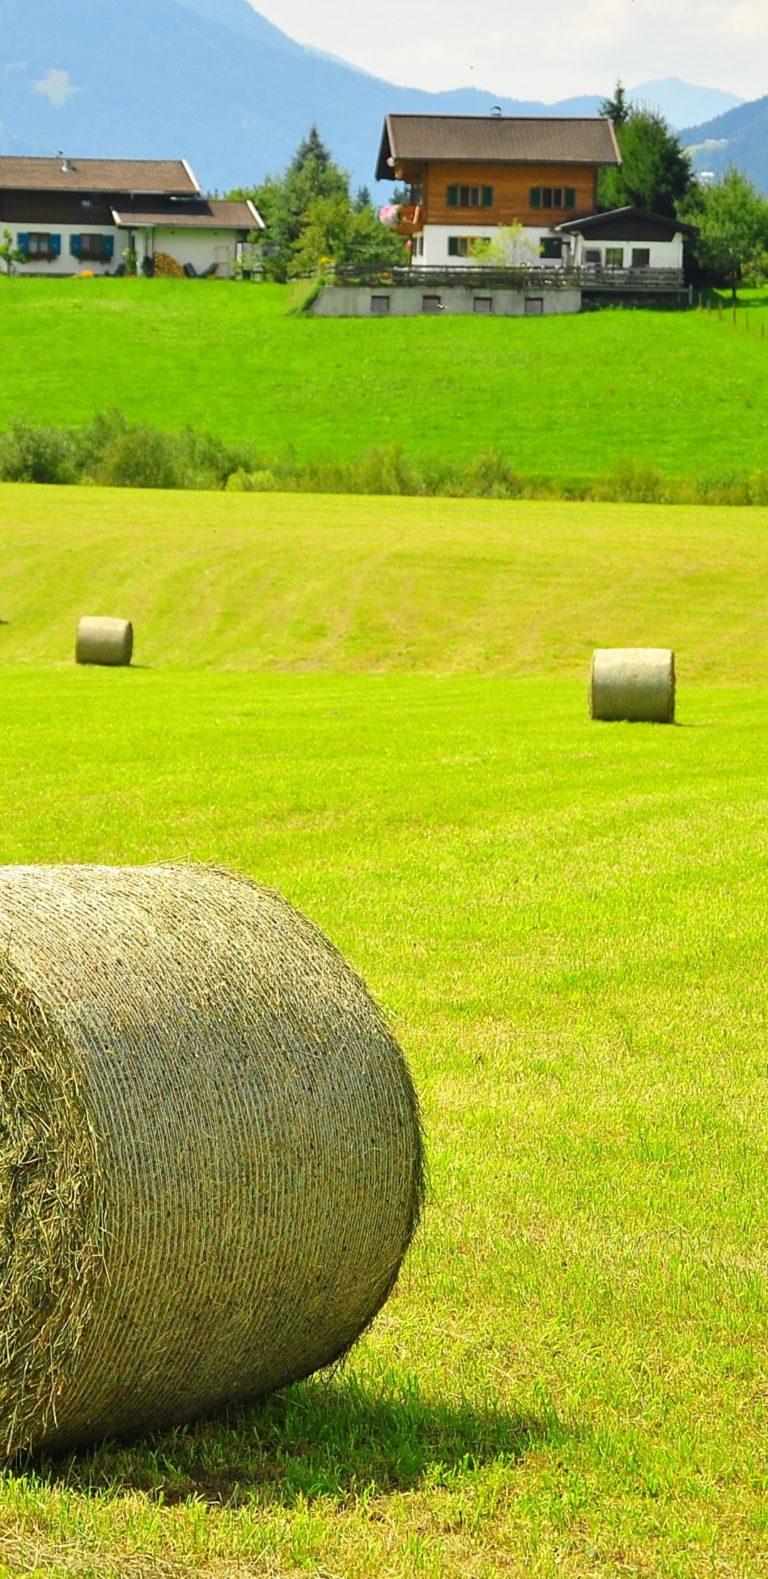 Austria Field Hay House Landscape 1080x2220 768x1579